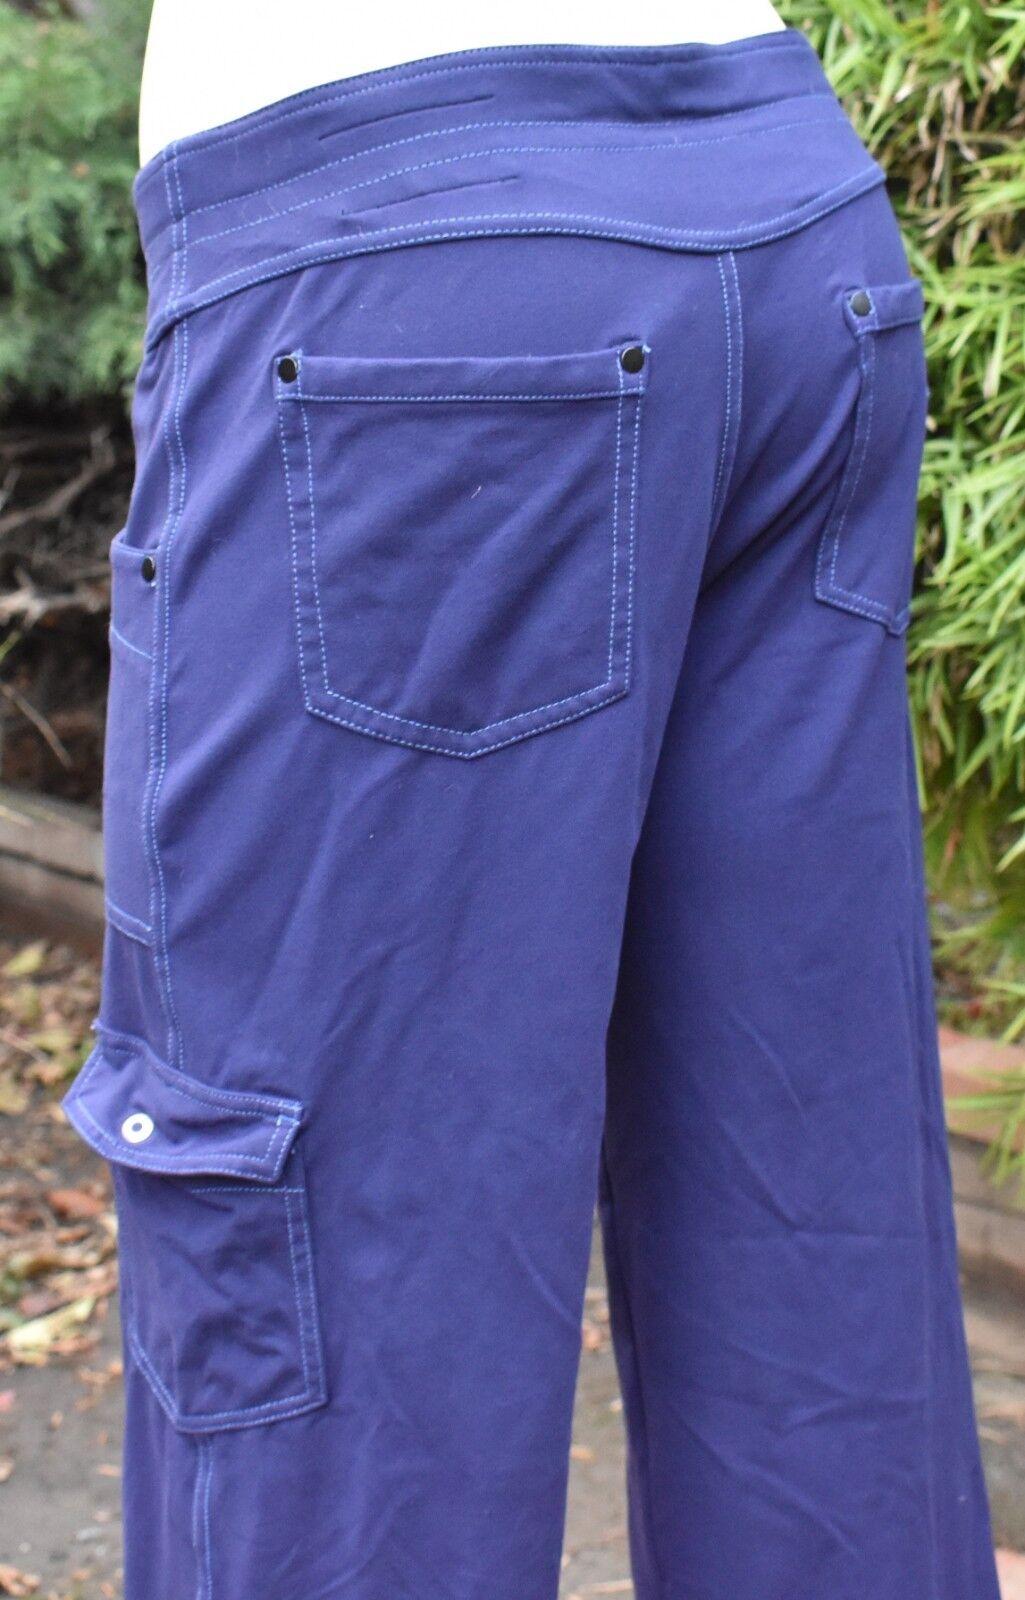 342696709d MOVA PANT SZ 10 US WOMEN S DARK blueE STRETCH PANTS 27 INSEAM PURPLE KUHL  ooaidv1885-Activewear Bottoms